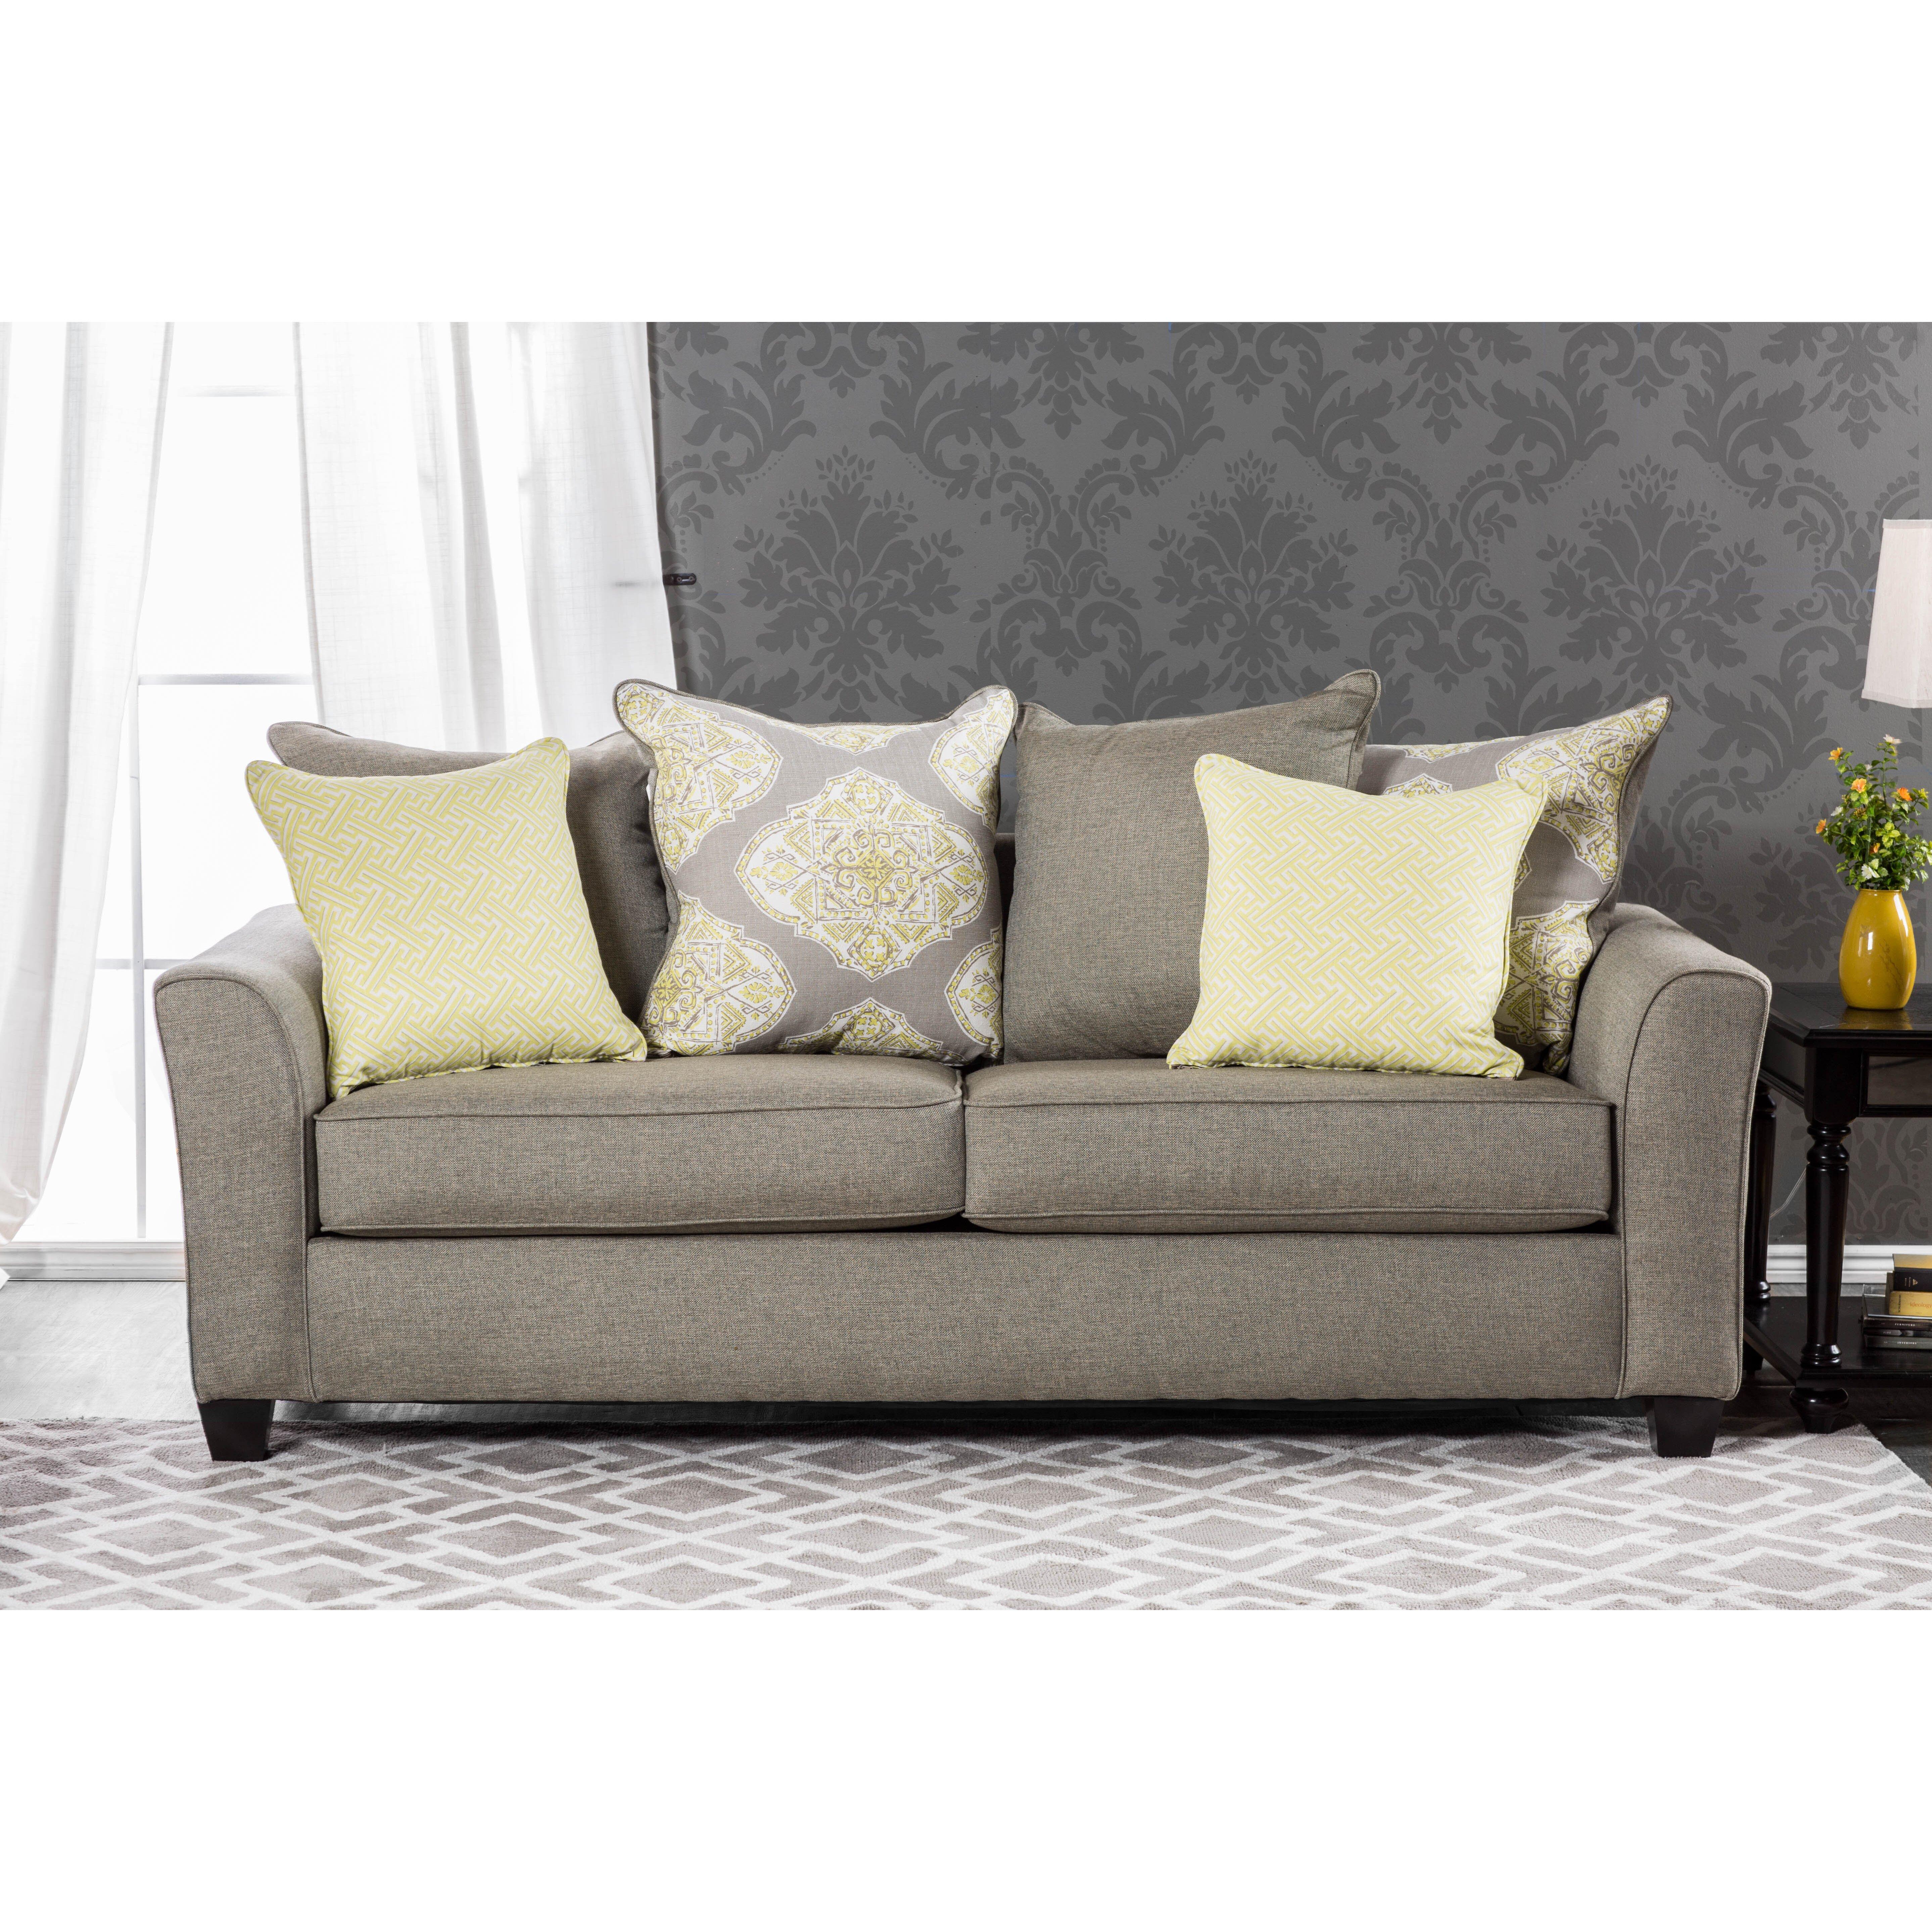 Darby Home Co Eberhardt Contemporary Sofa Wayfair